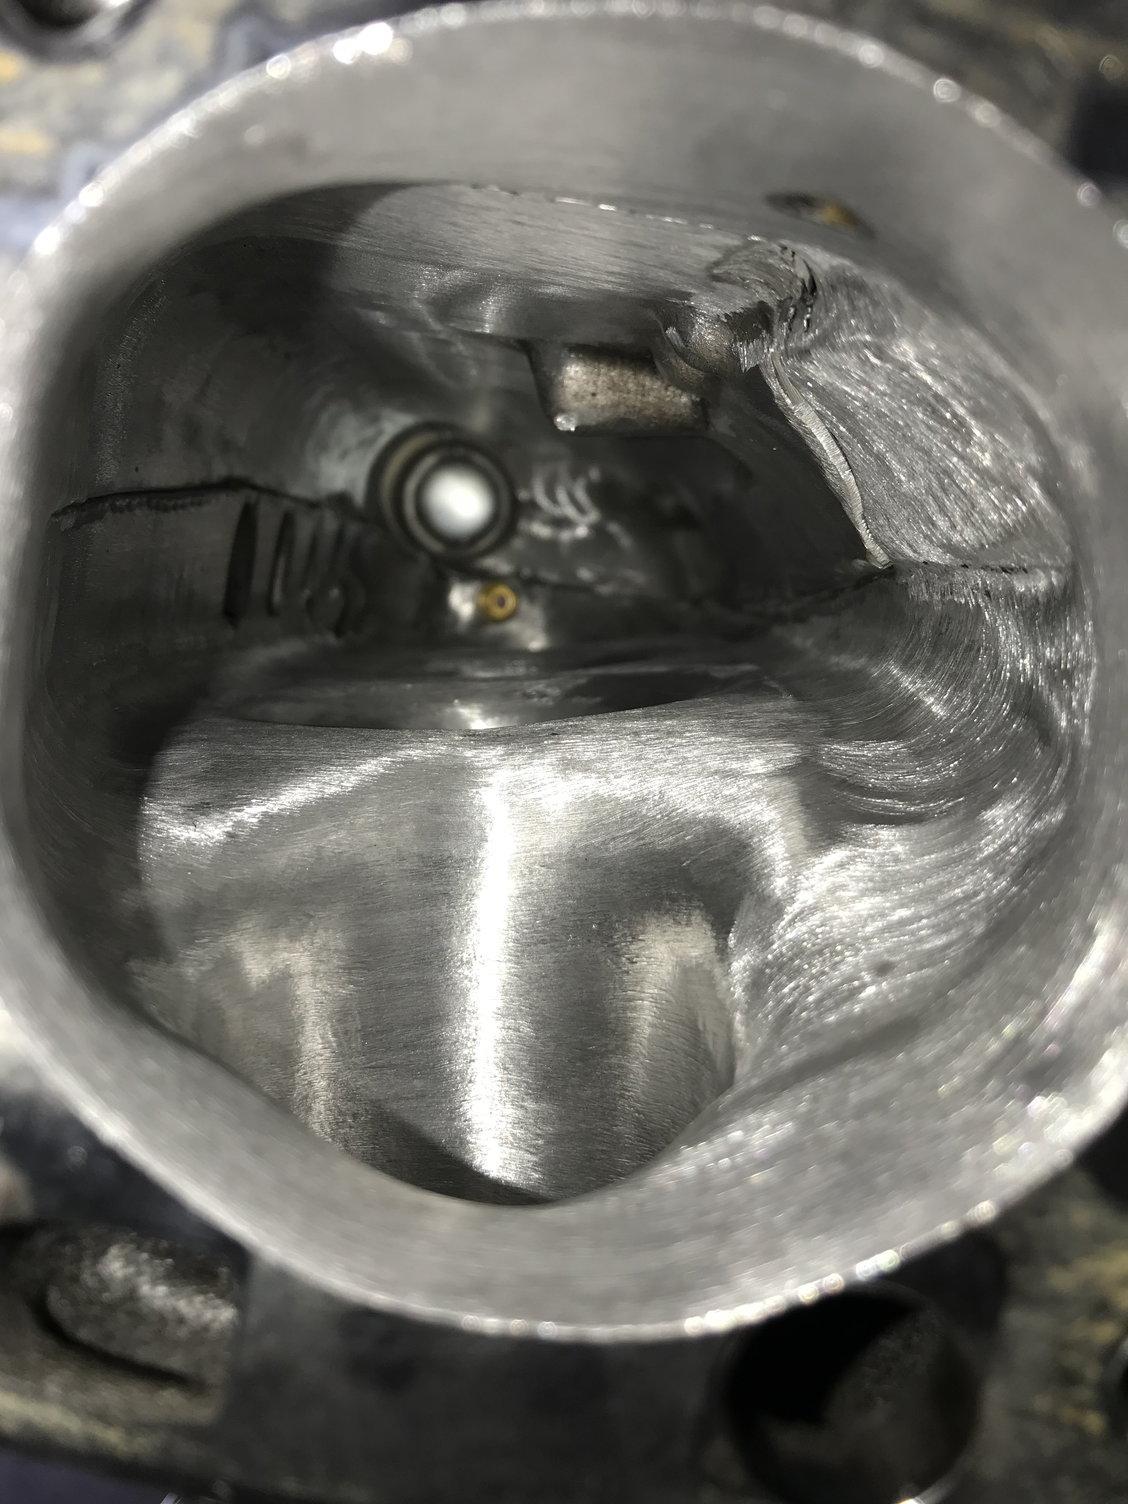 Ported oem intake manifold - Page 3 - S2KI Honda S2000 Forums